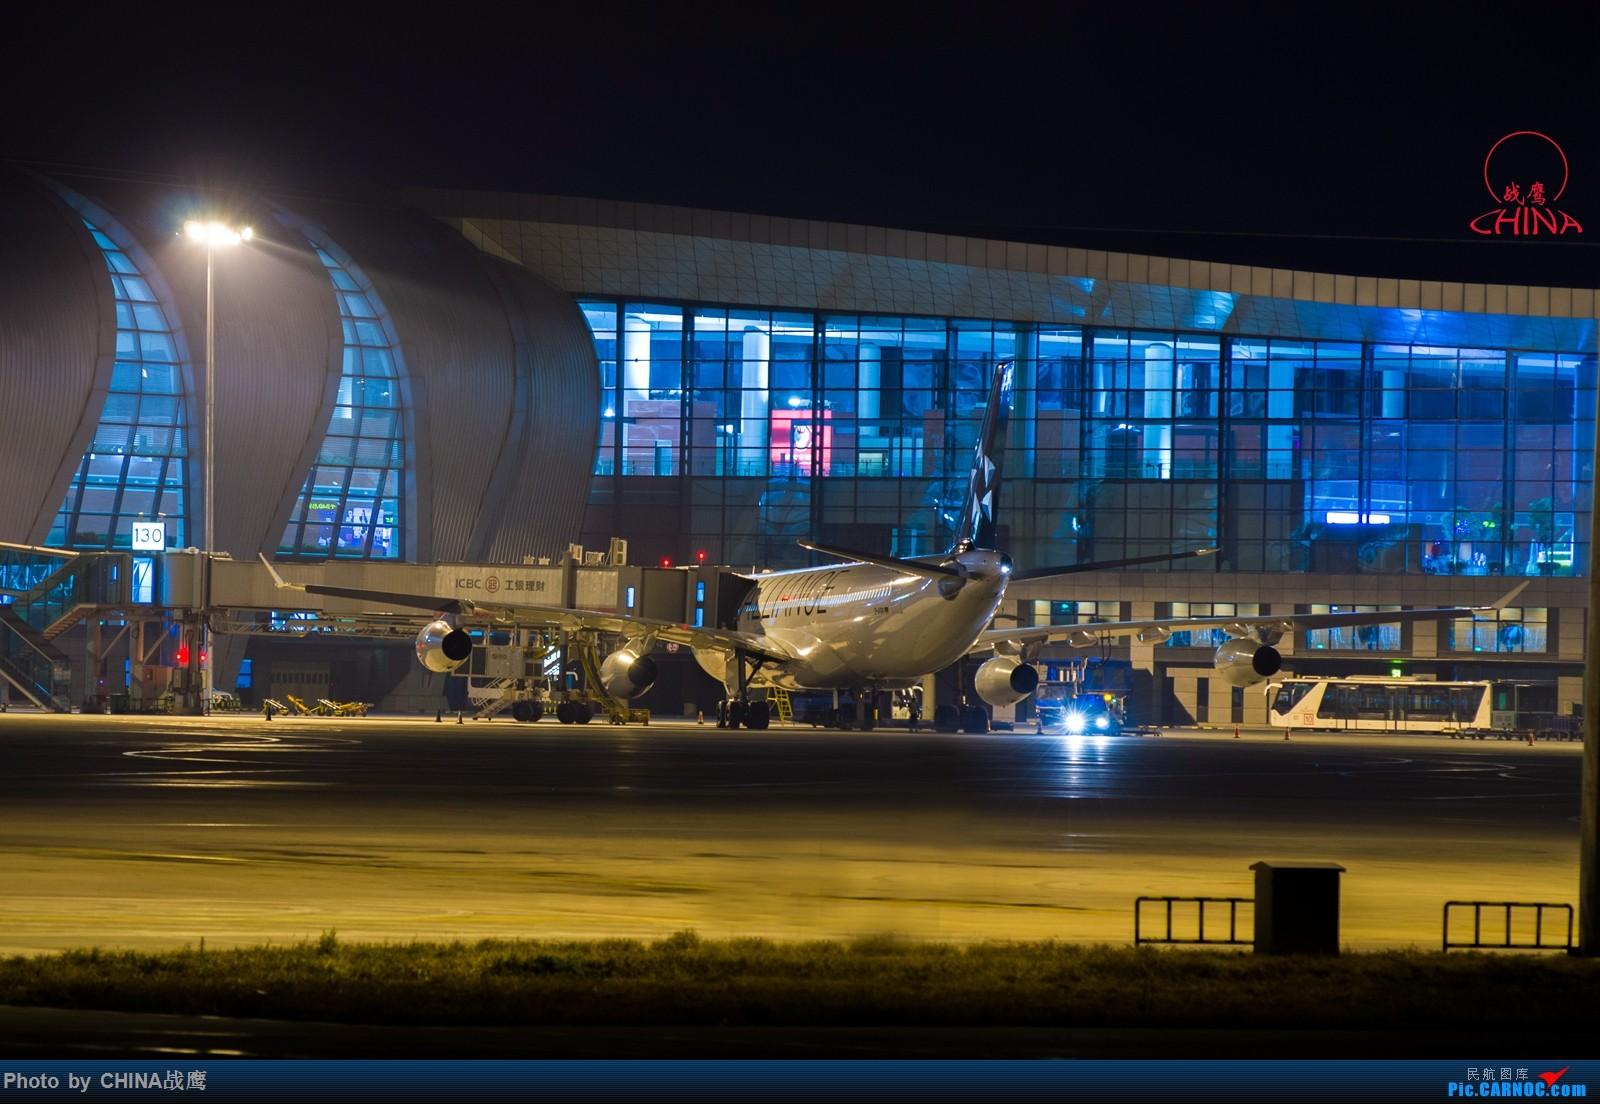 Re:[原创]【SHE】第三季度桃仙拍飞机集锦 AIRBUS A340-300 D-AIFA 中国沈阳桃仙国际机场